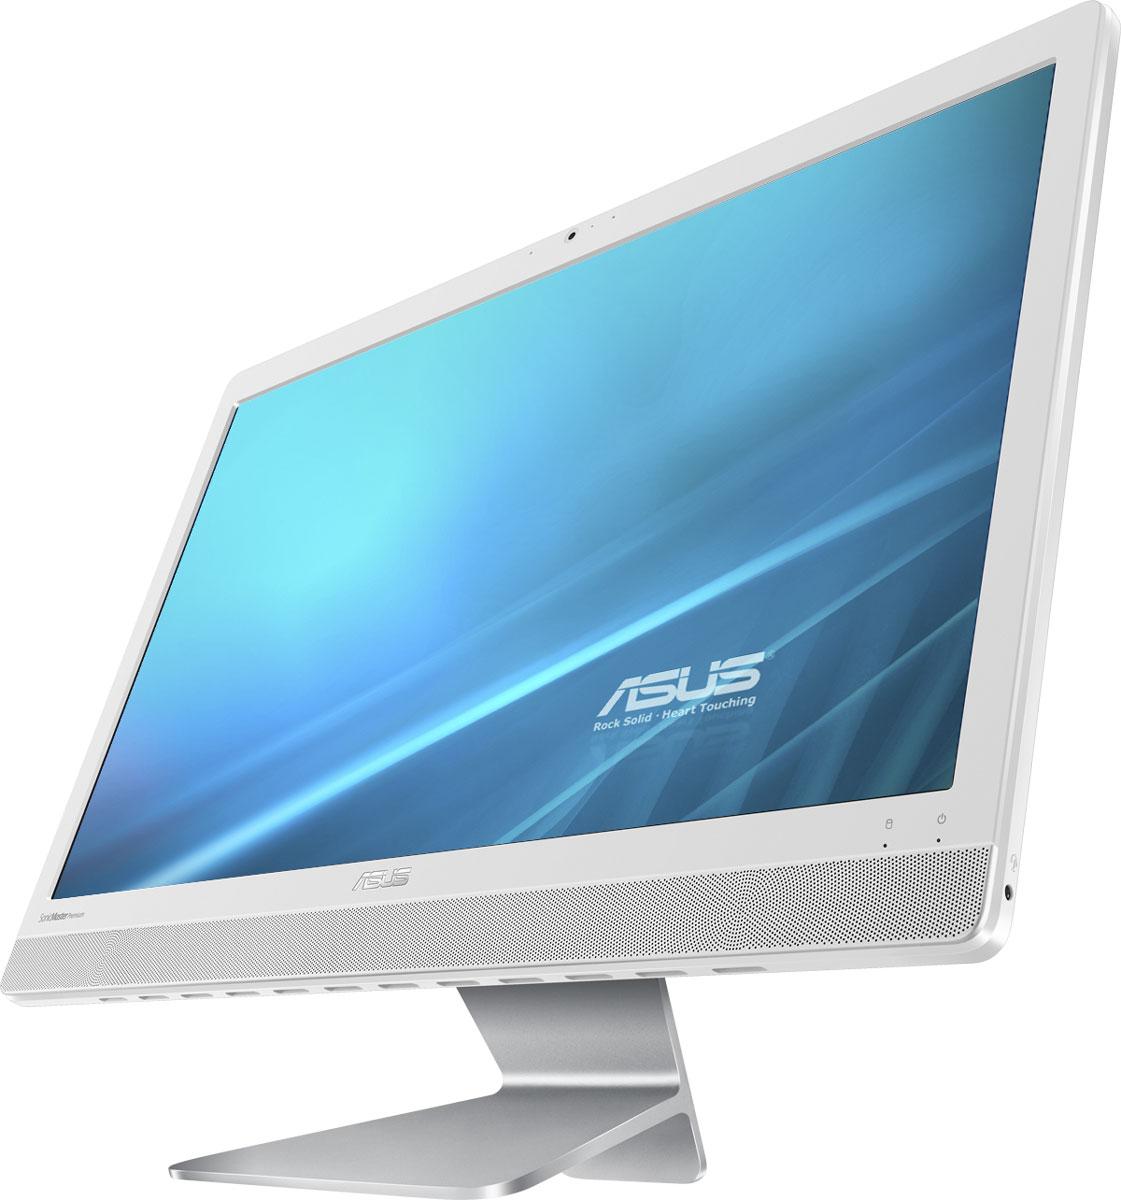 ASUS Vivo AiO V221ICUK-WA011D, White моноблок - Настольные компьютеры и моноблоки